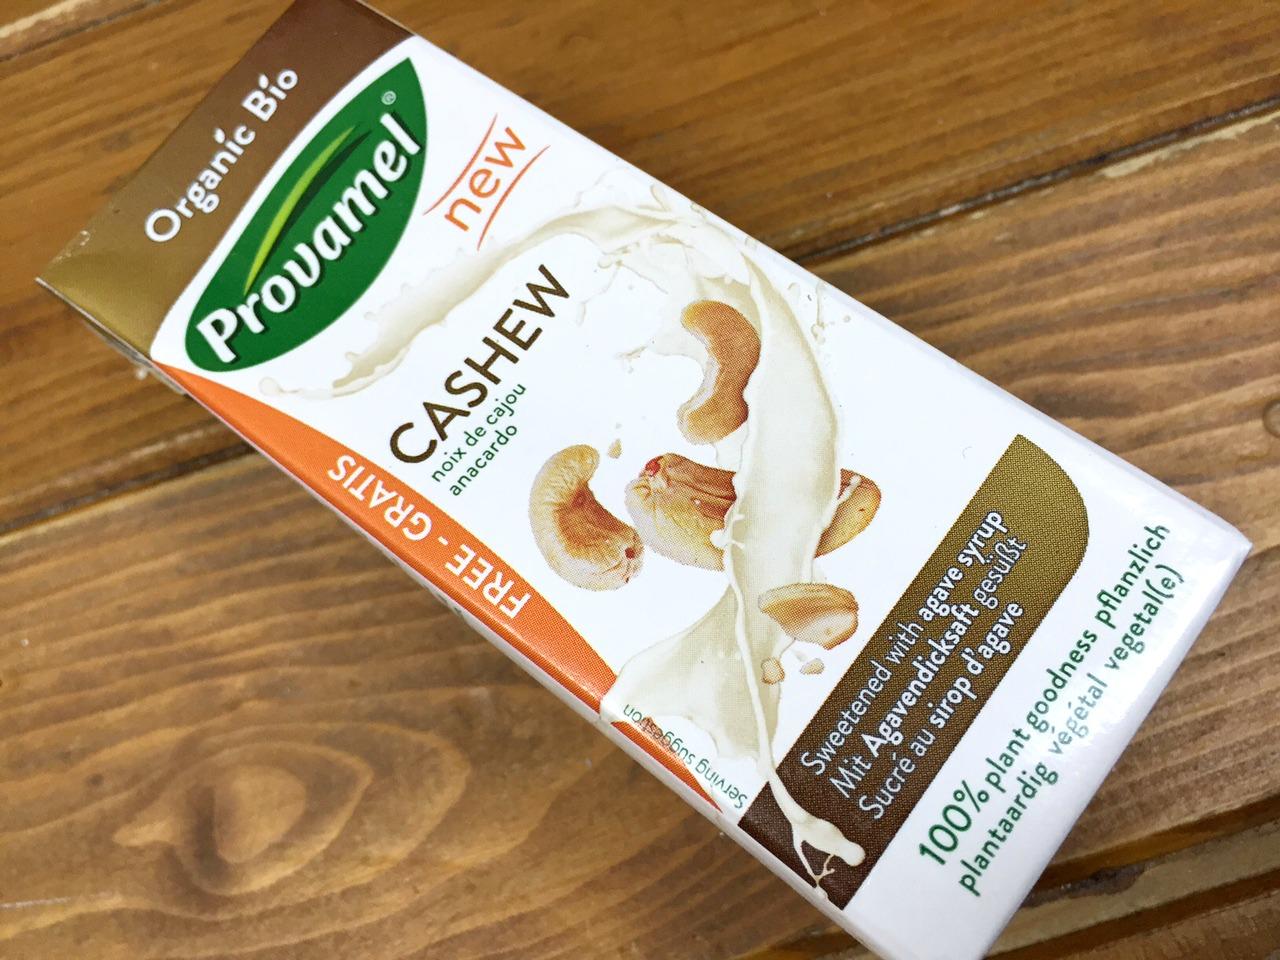 Provamel Cashew Milk Drink